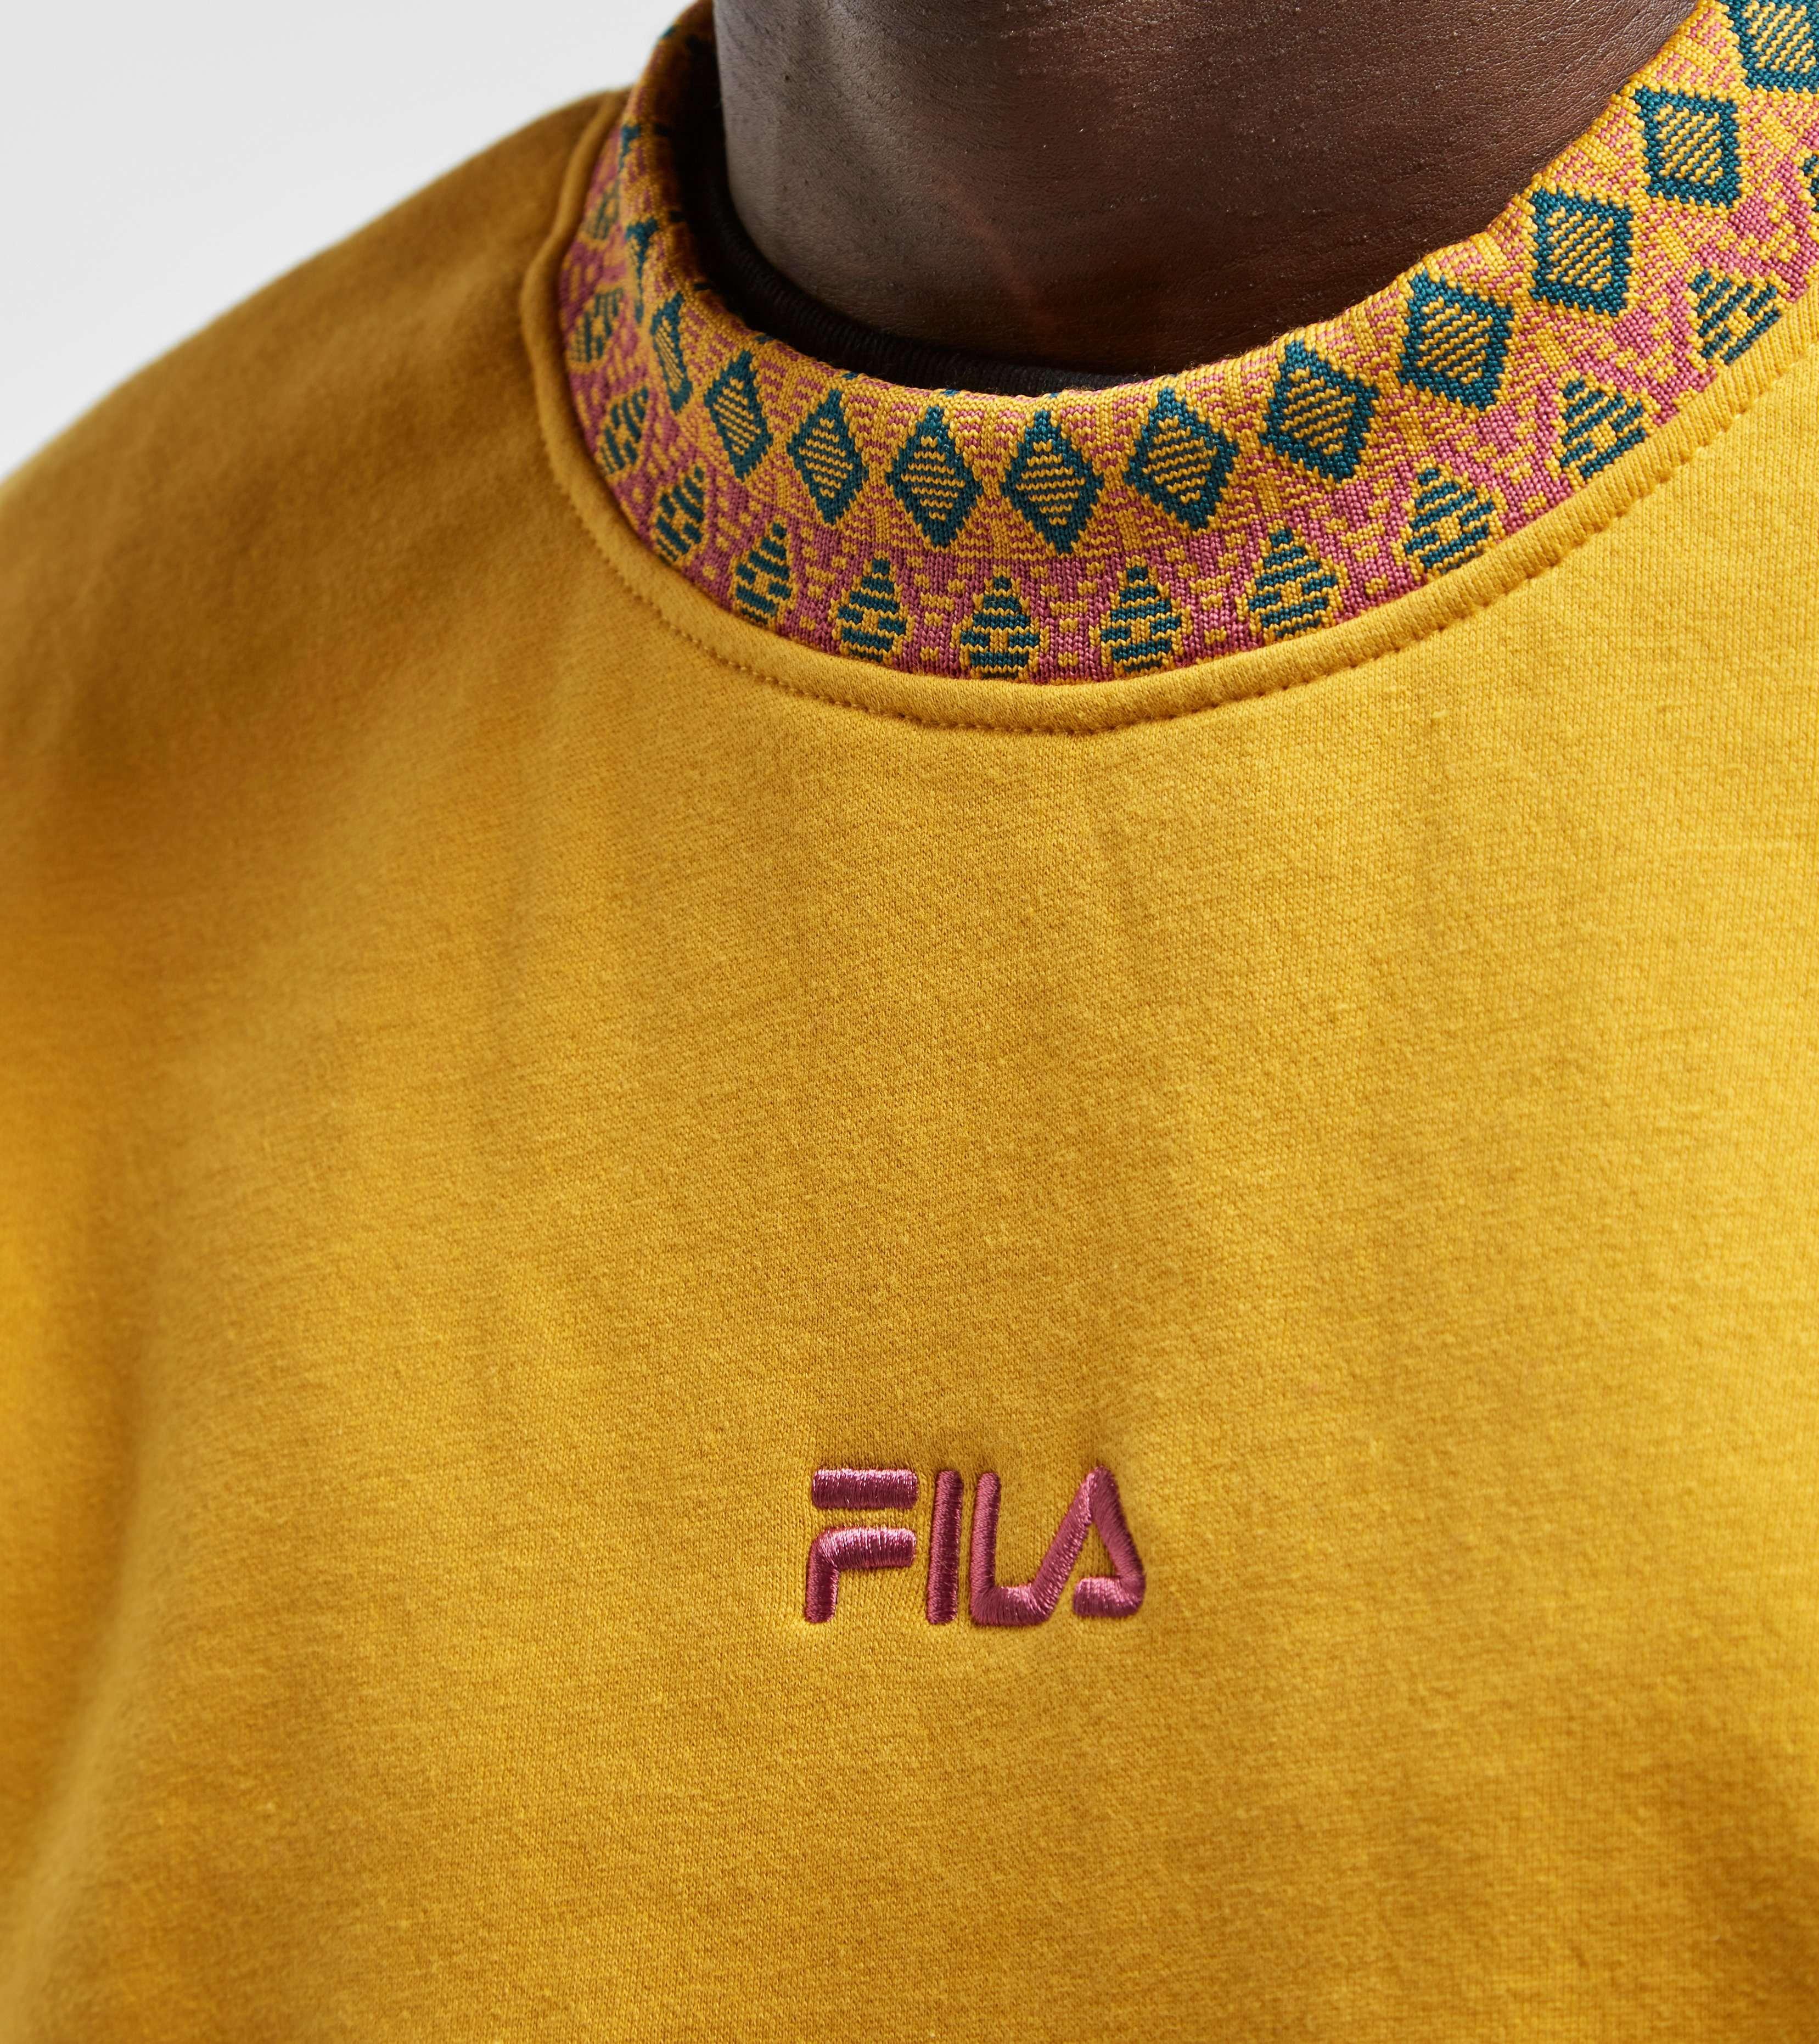 Fila Broadpeak Crewneck Sweatshirt - size? Exclusive